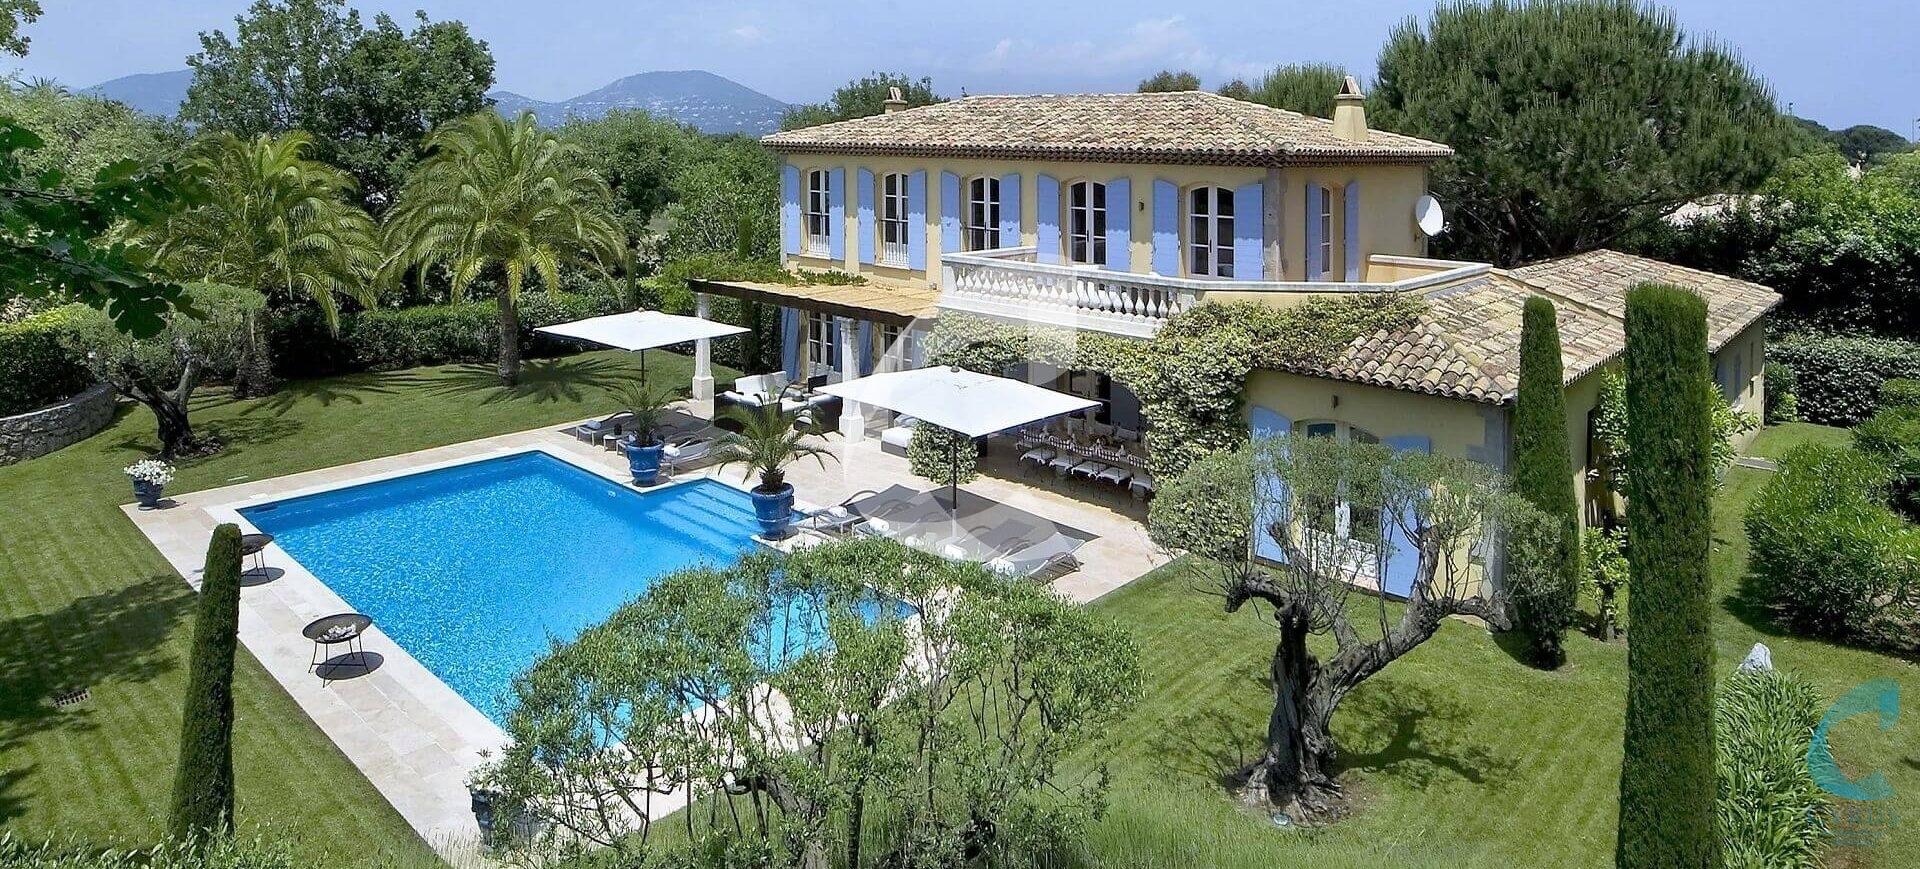 Villa with pool Rent Saint-Tropez